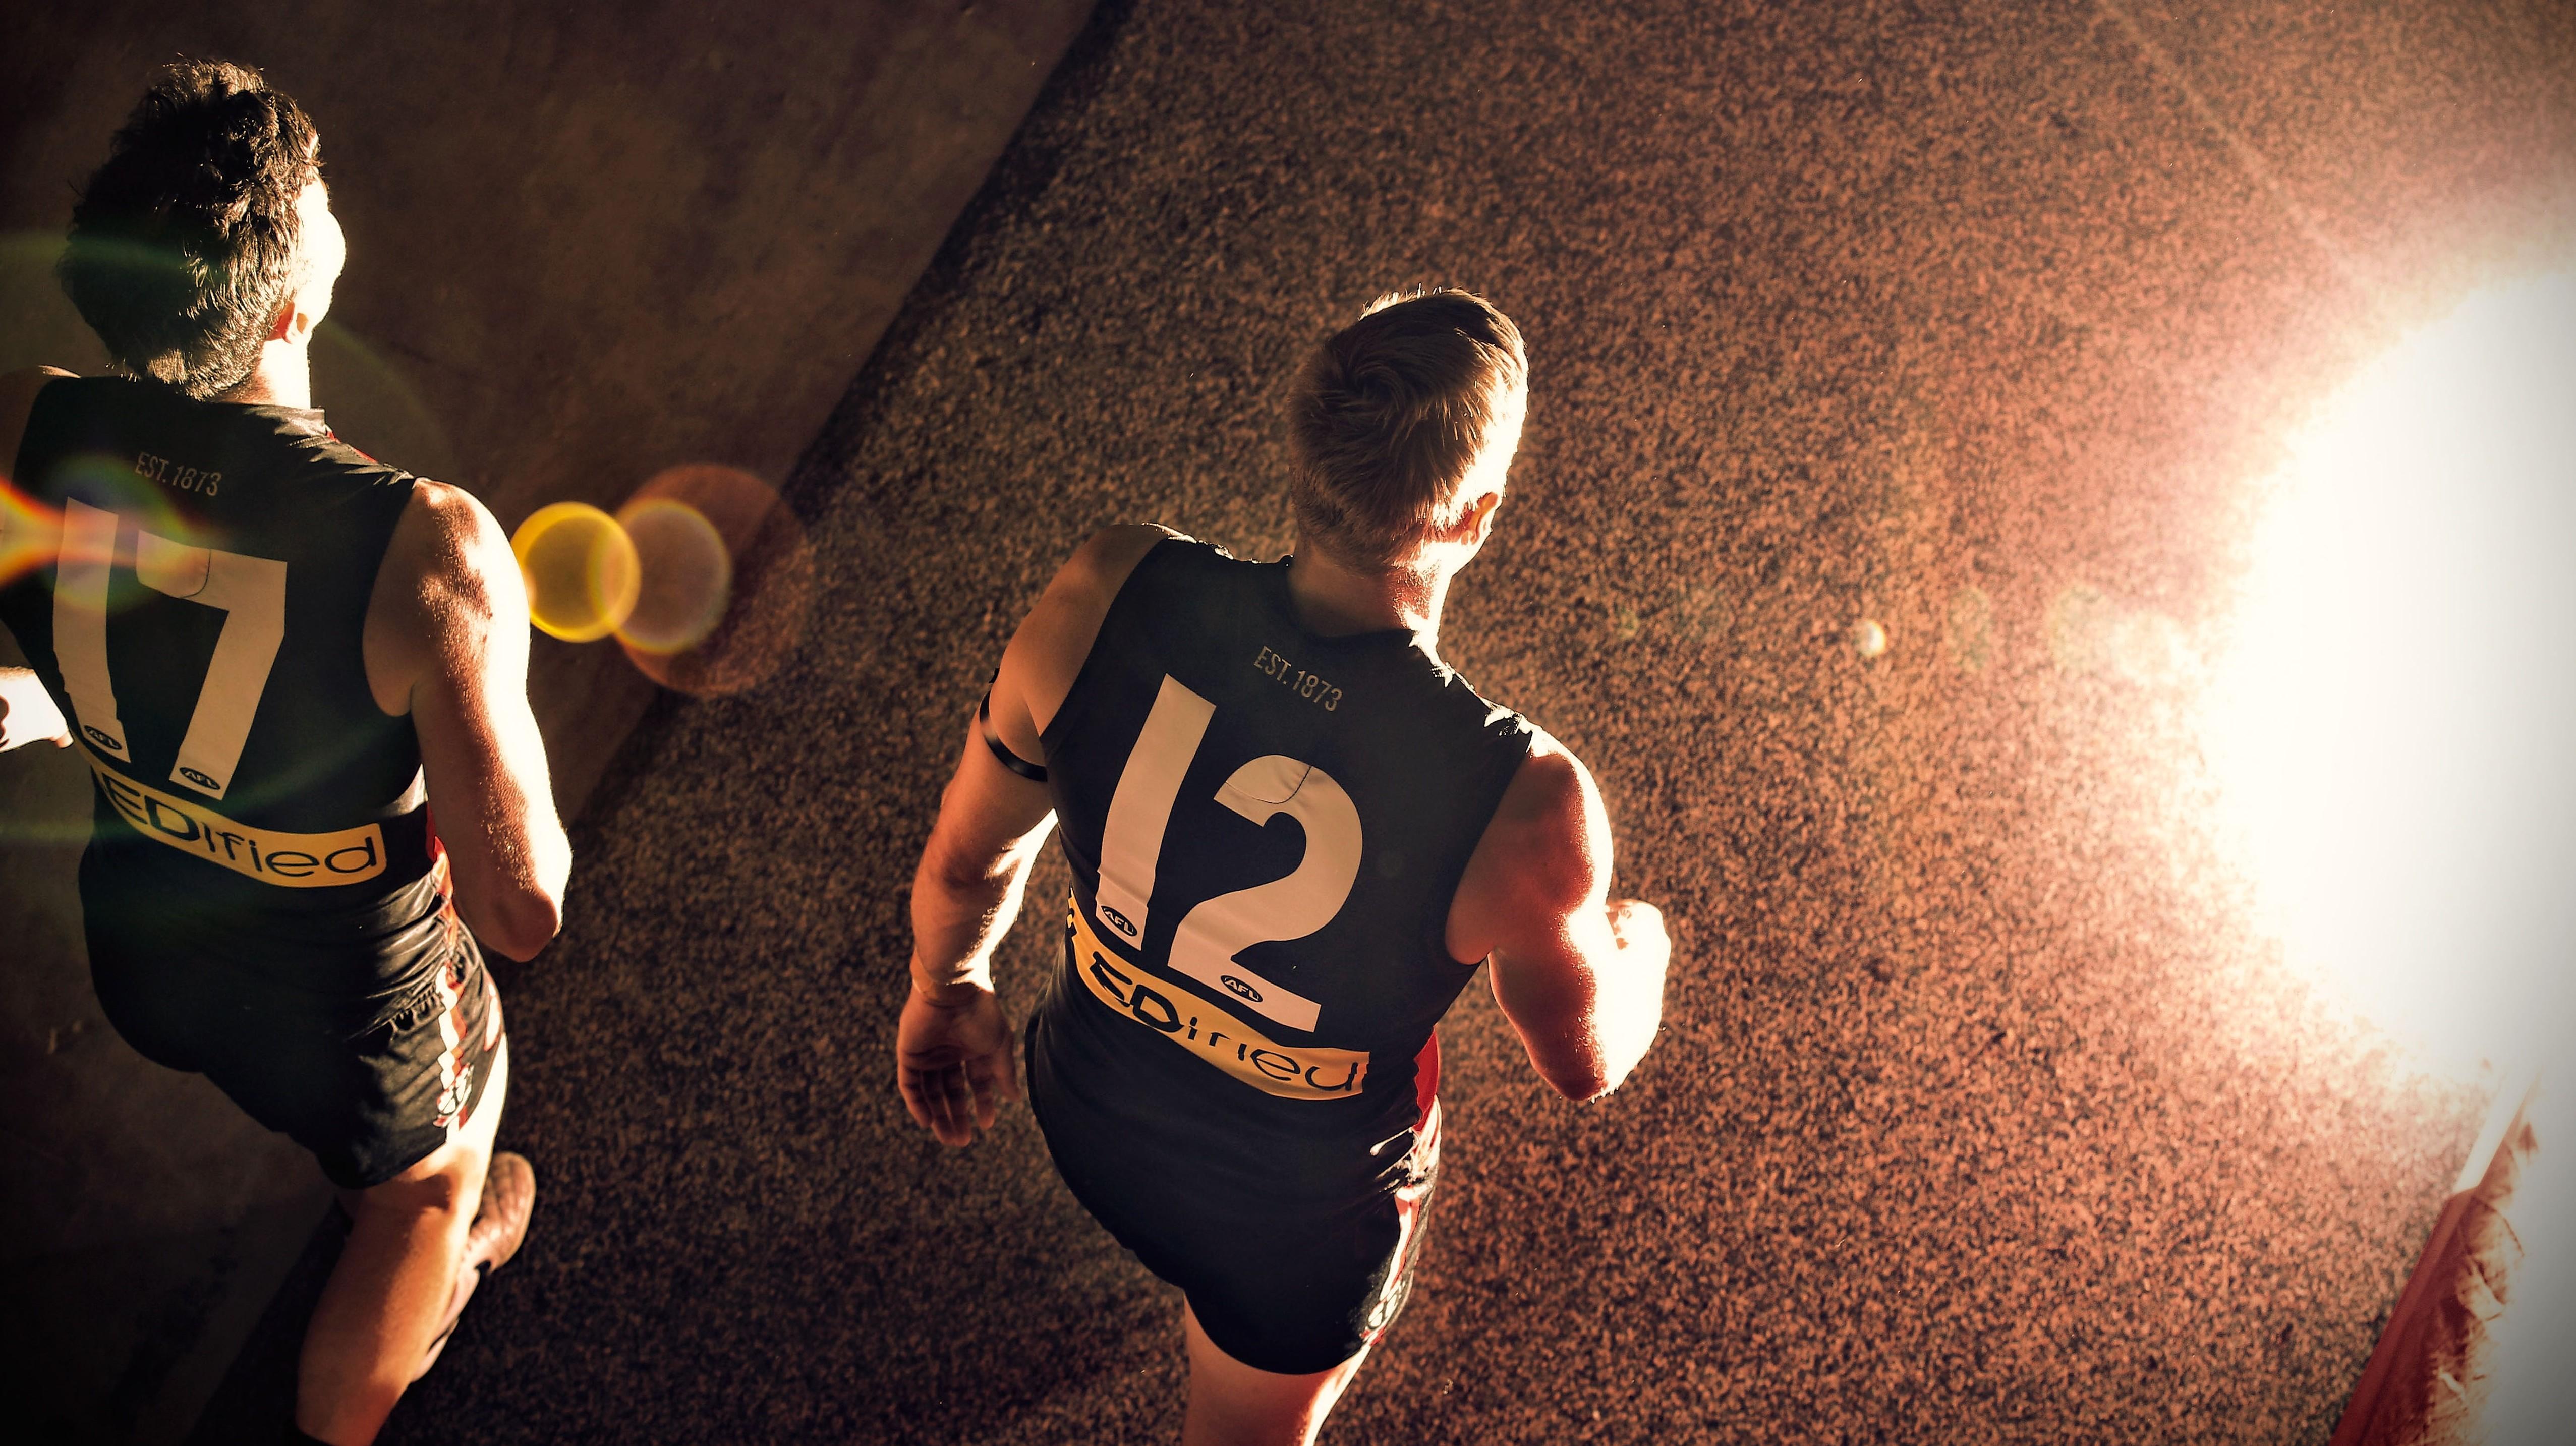 AFL 2015 Rd 22 - St Kilda v Sydney